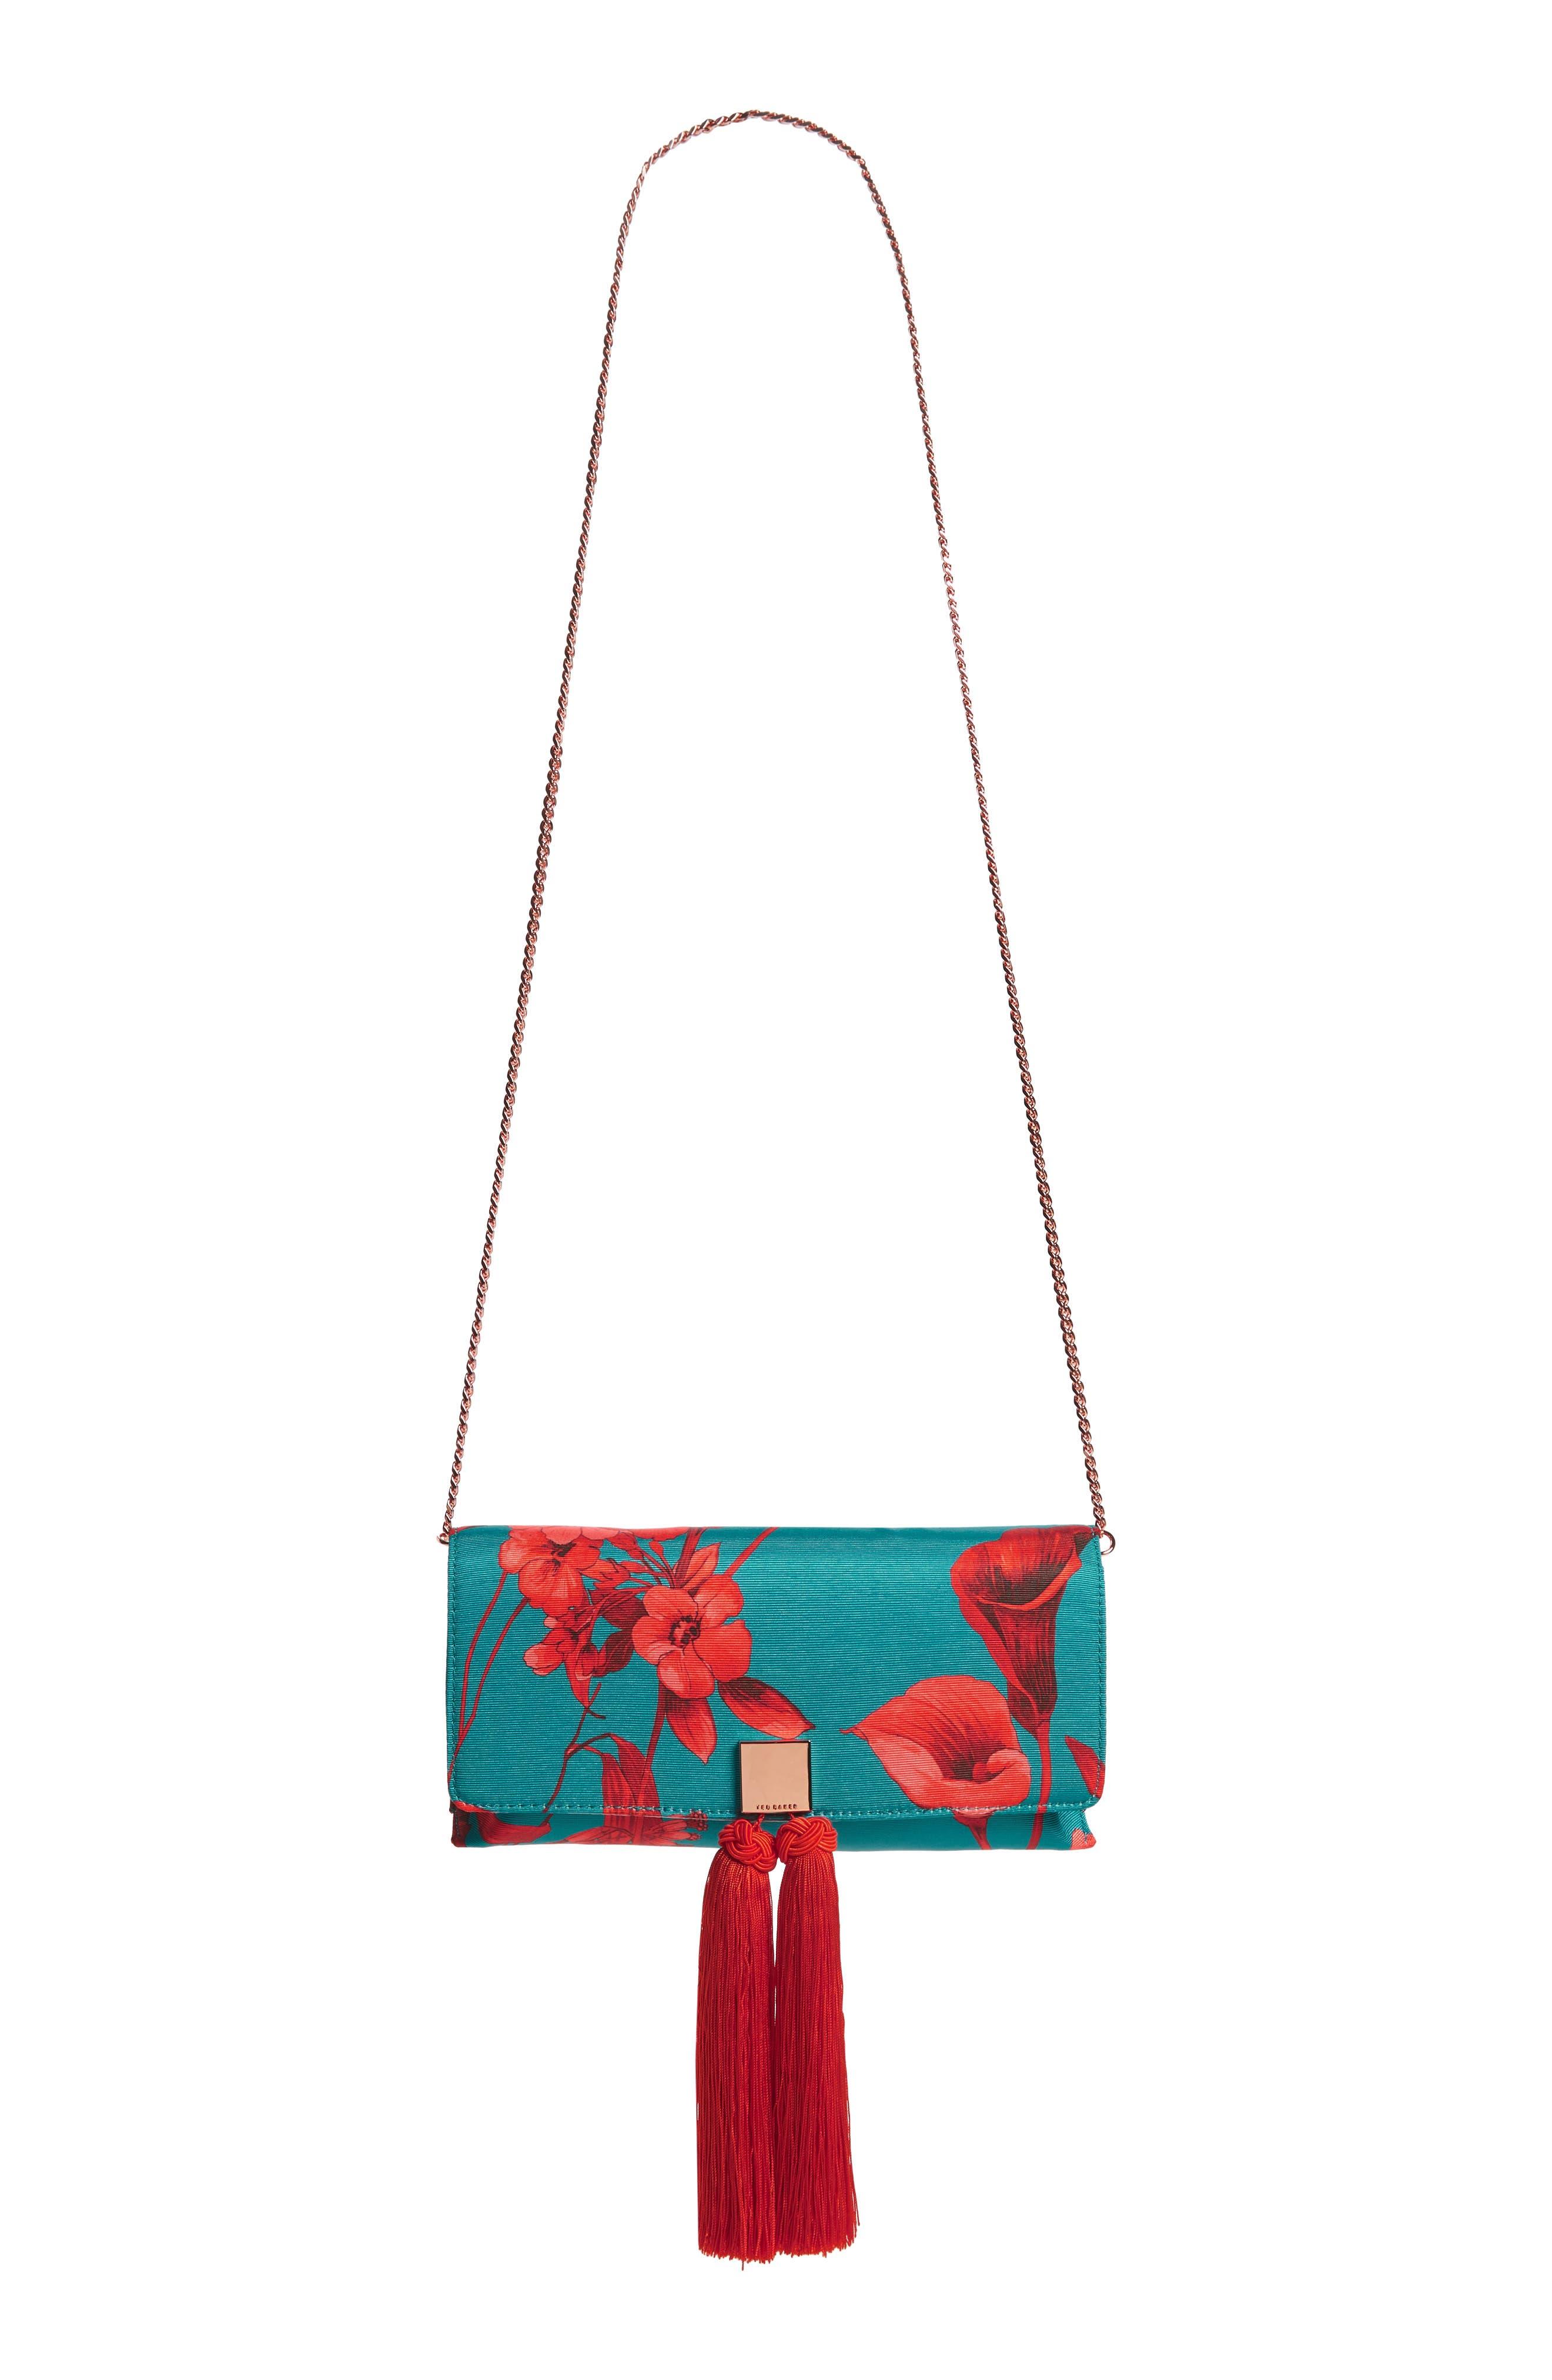 Darlee Fantasia Tassel Bag,                             Alternate thumbnail 2, color,                             TURQUOISE